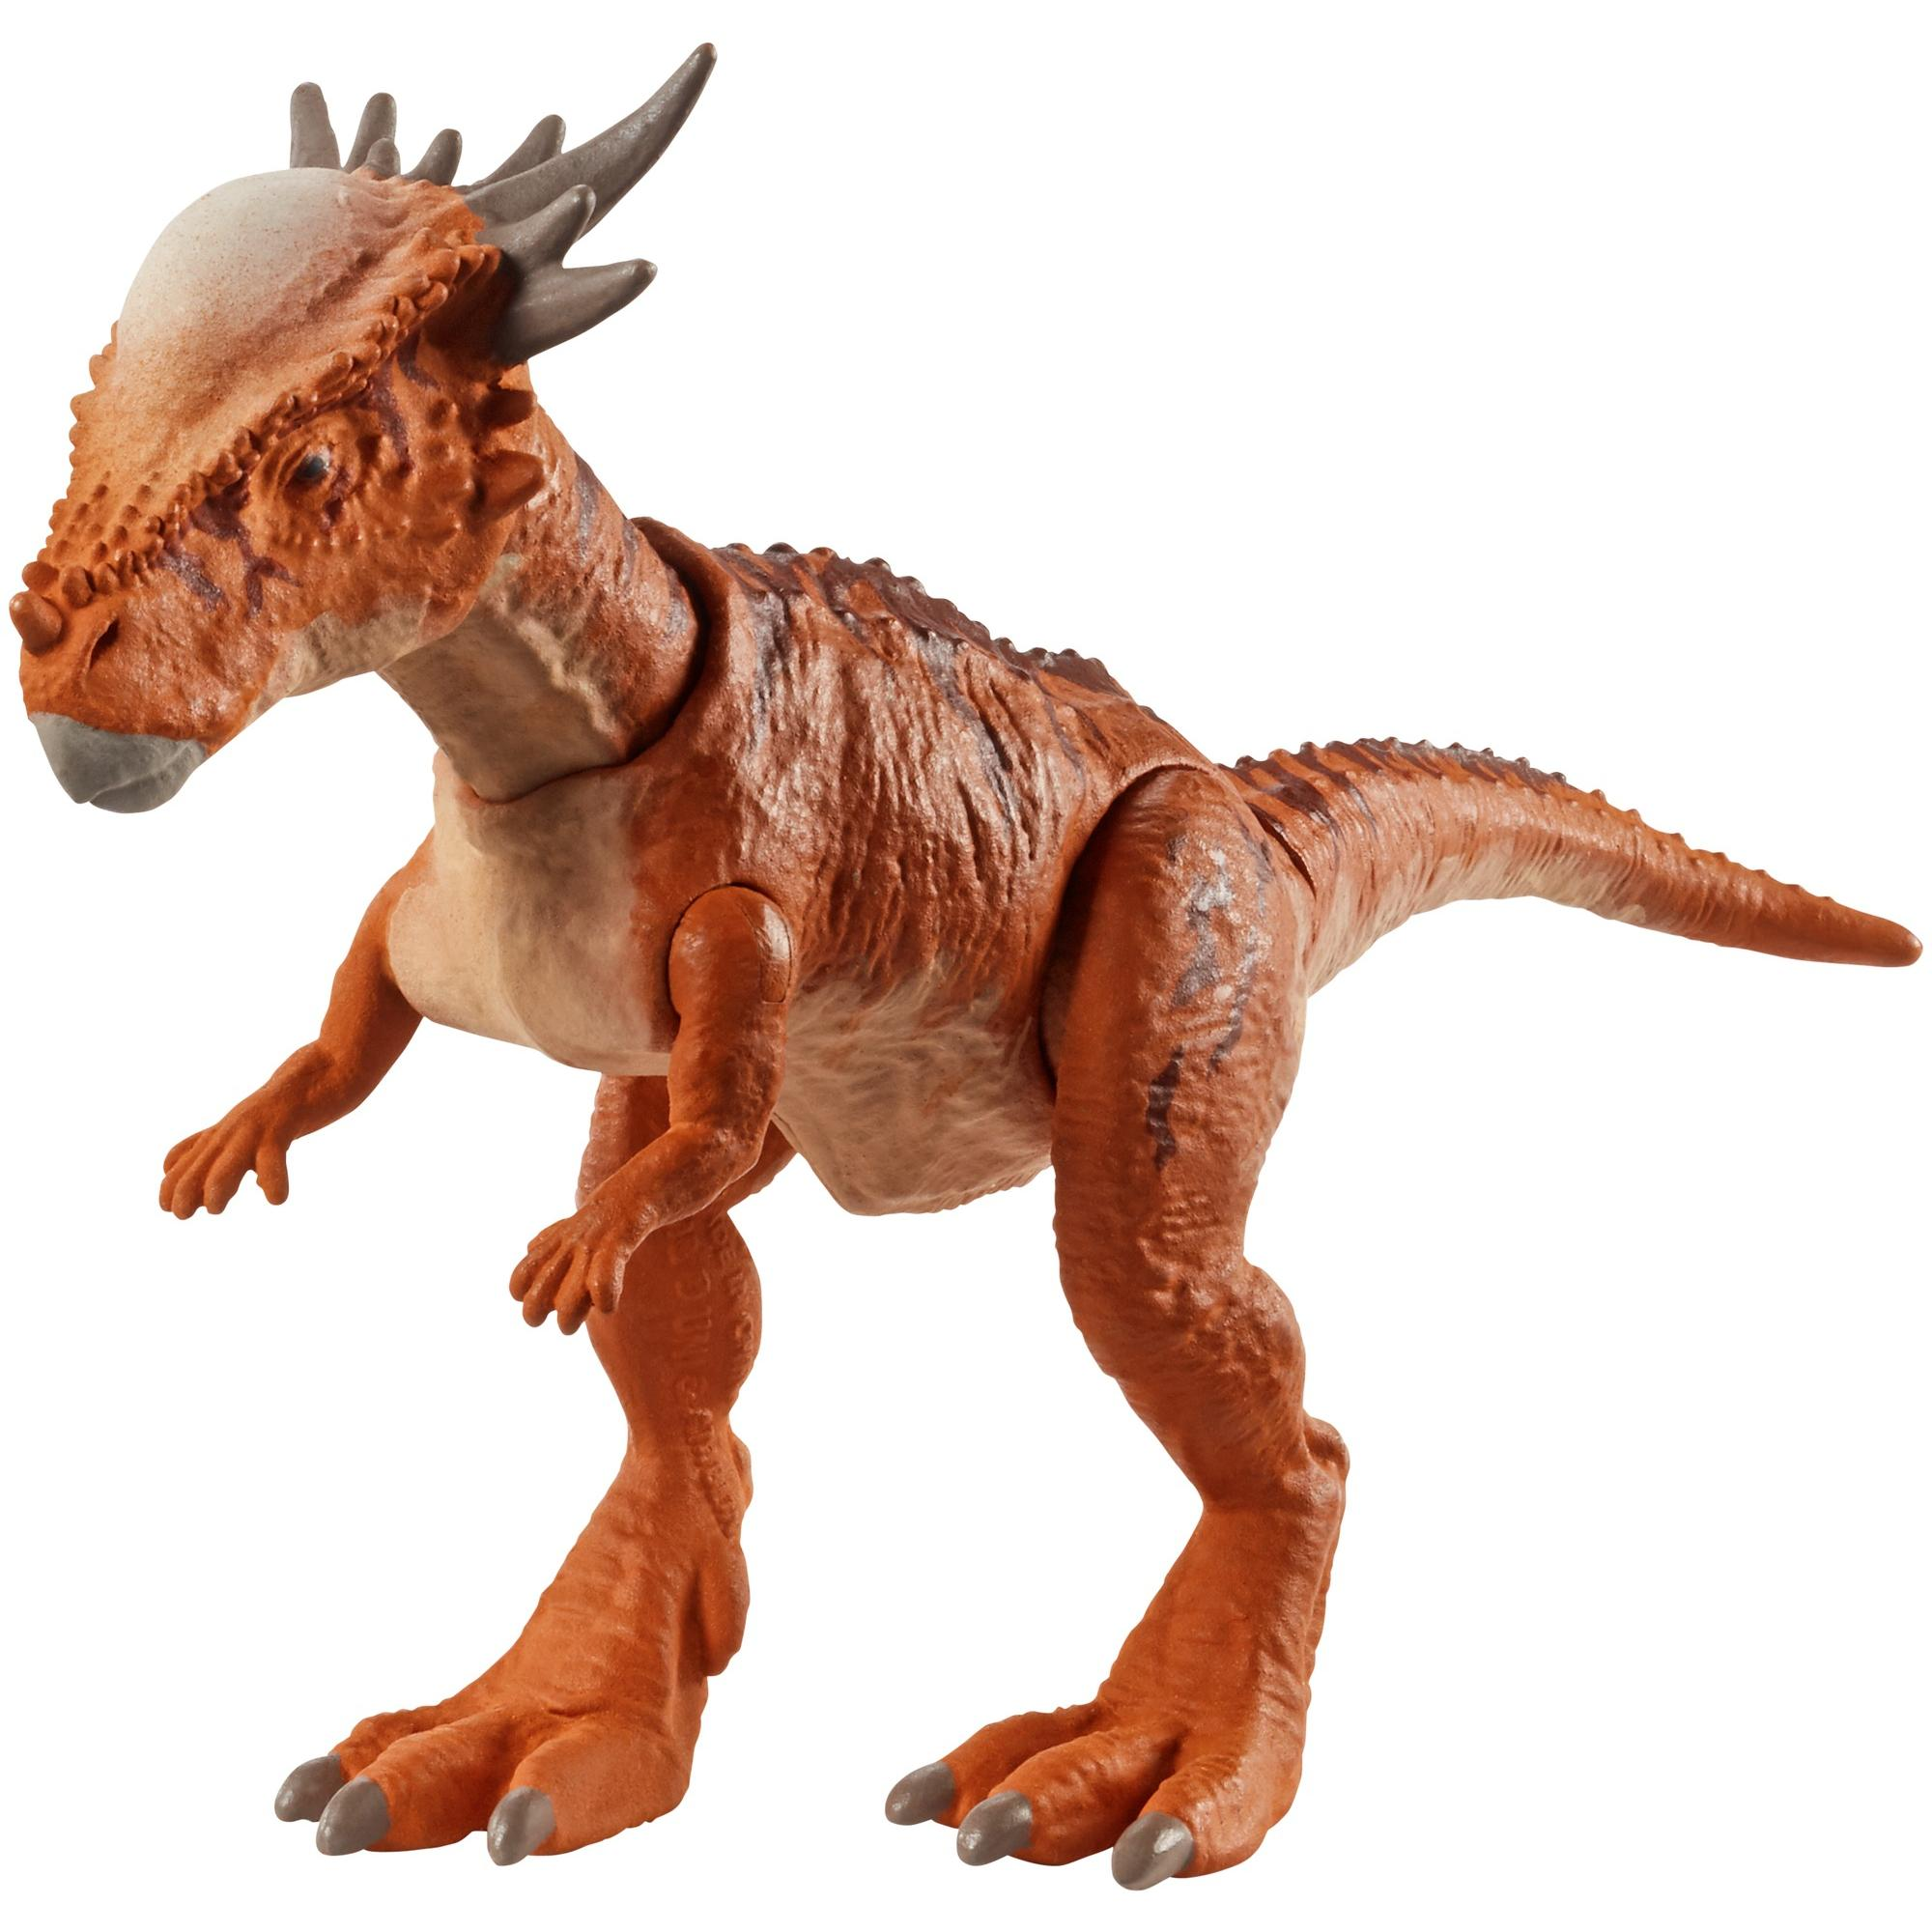 Jurassic World Indoraptor Figure Frustration Free Packaging USA NO TAX FREE SHIP